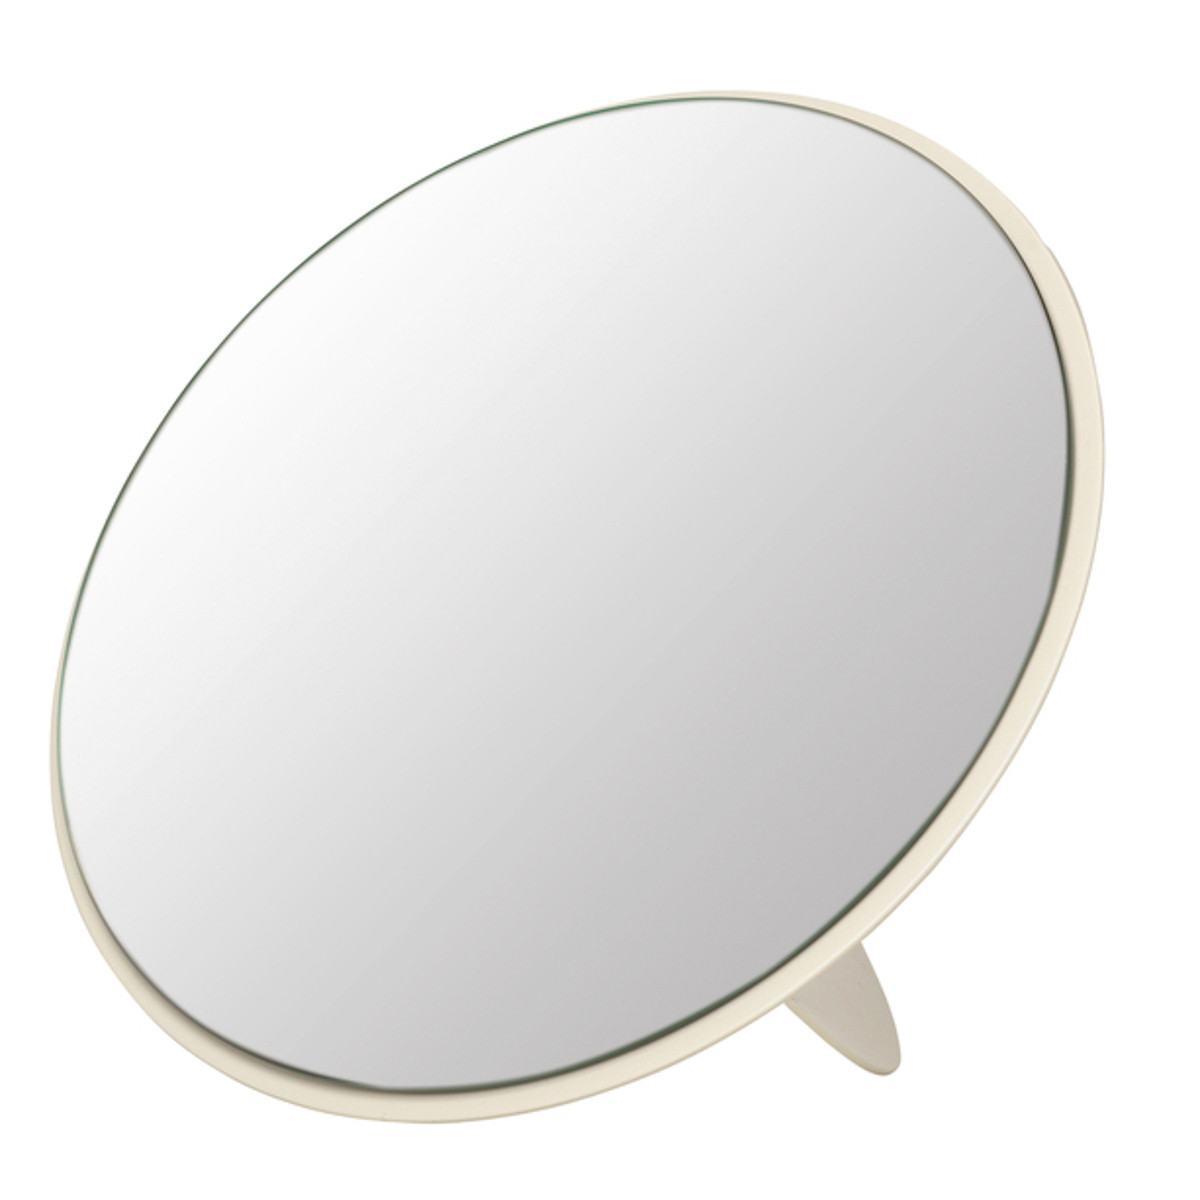 Kristina Dam Mirror Sculpture